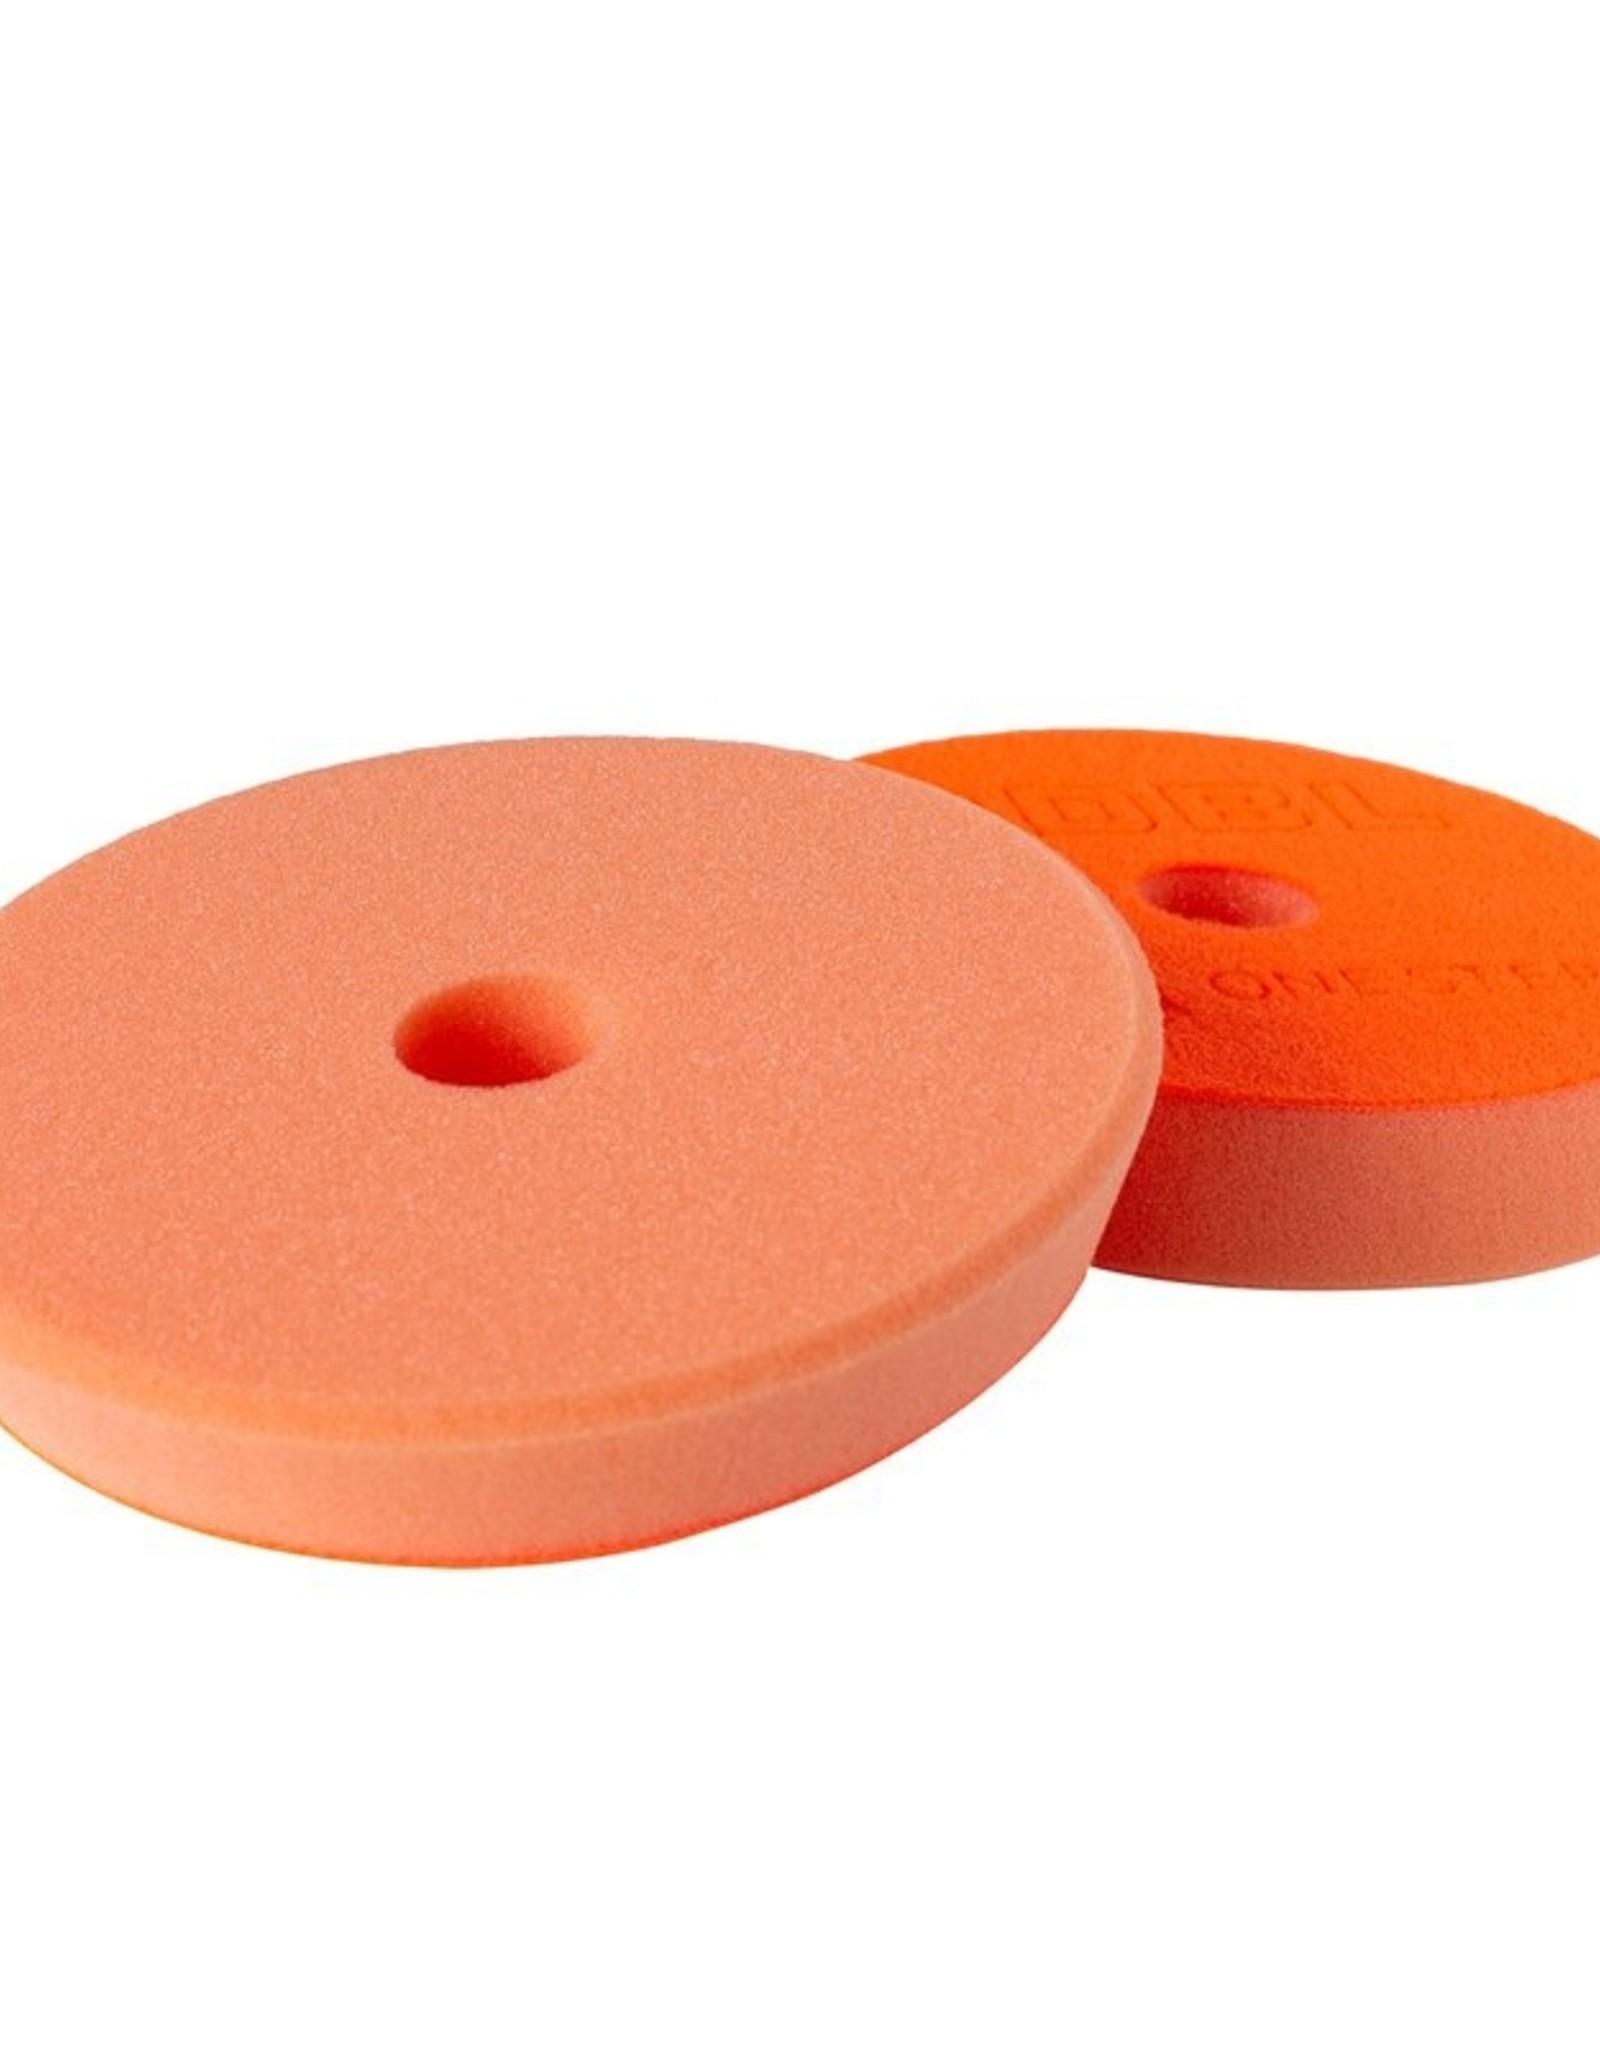 ADBL Roller Pad DA One Step 75mm